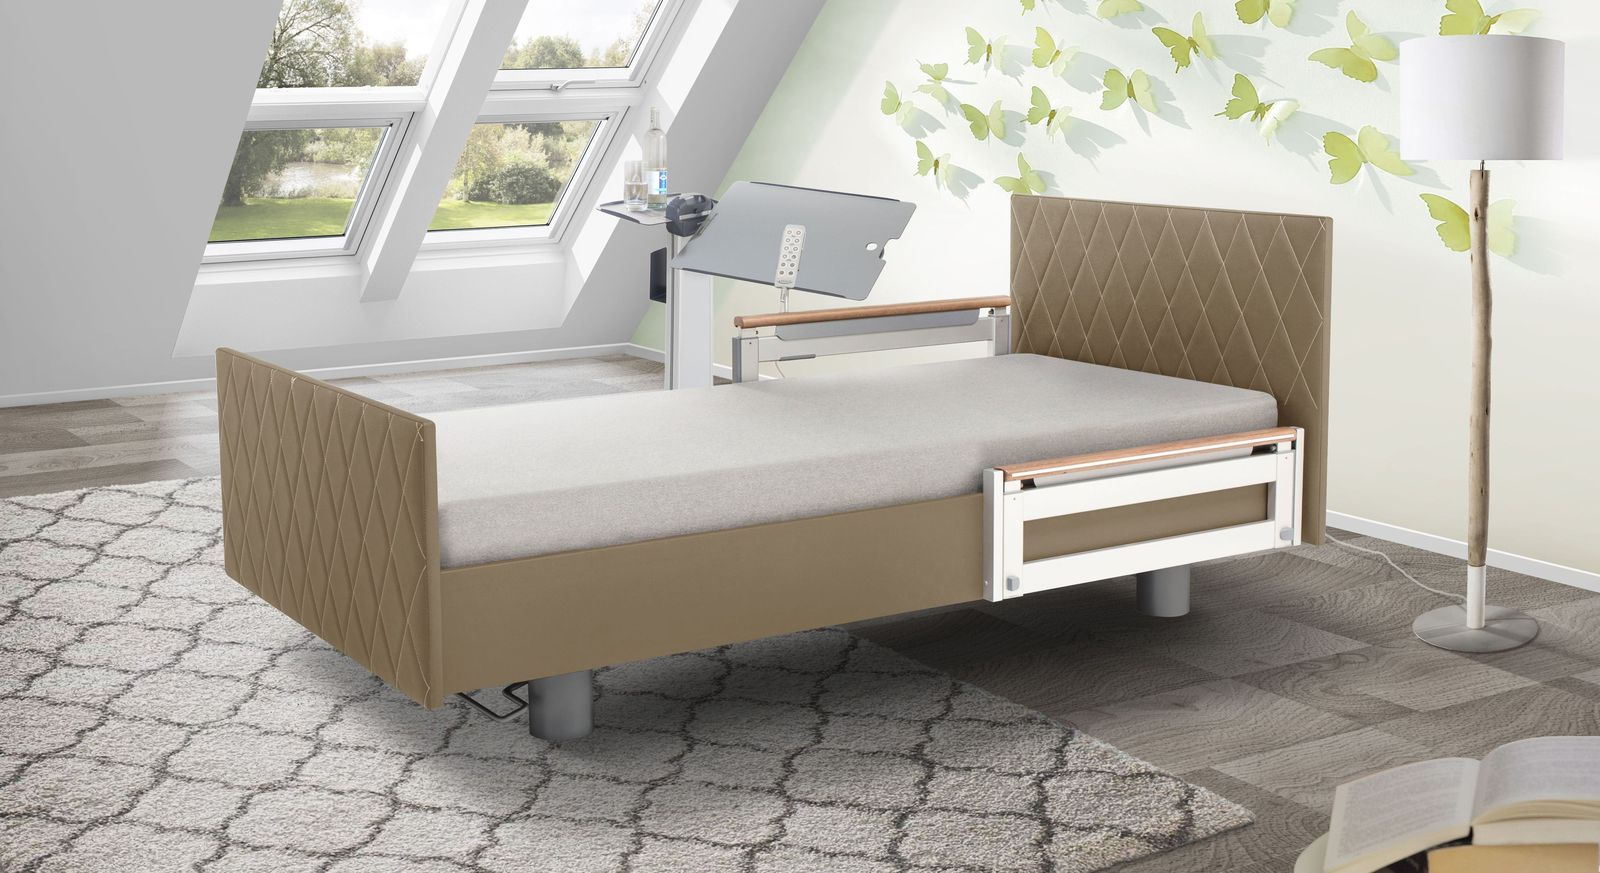 Komfortbett mit Pflegebett-Funktion Borkum mit taupefarbenem Kunstlederbezug